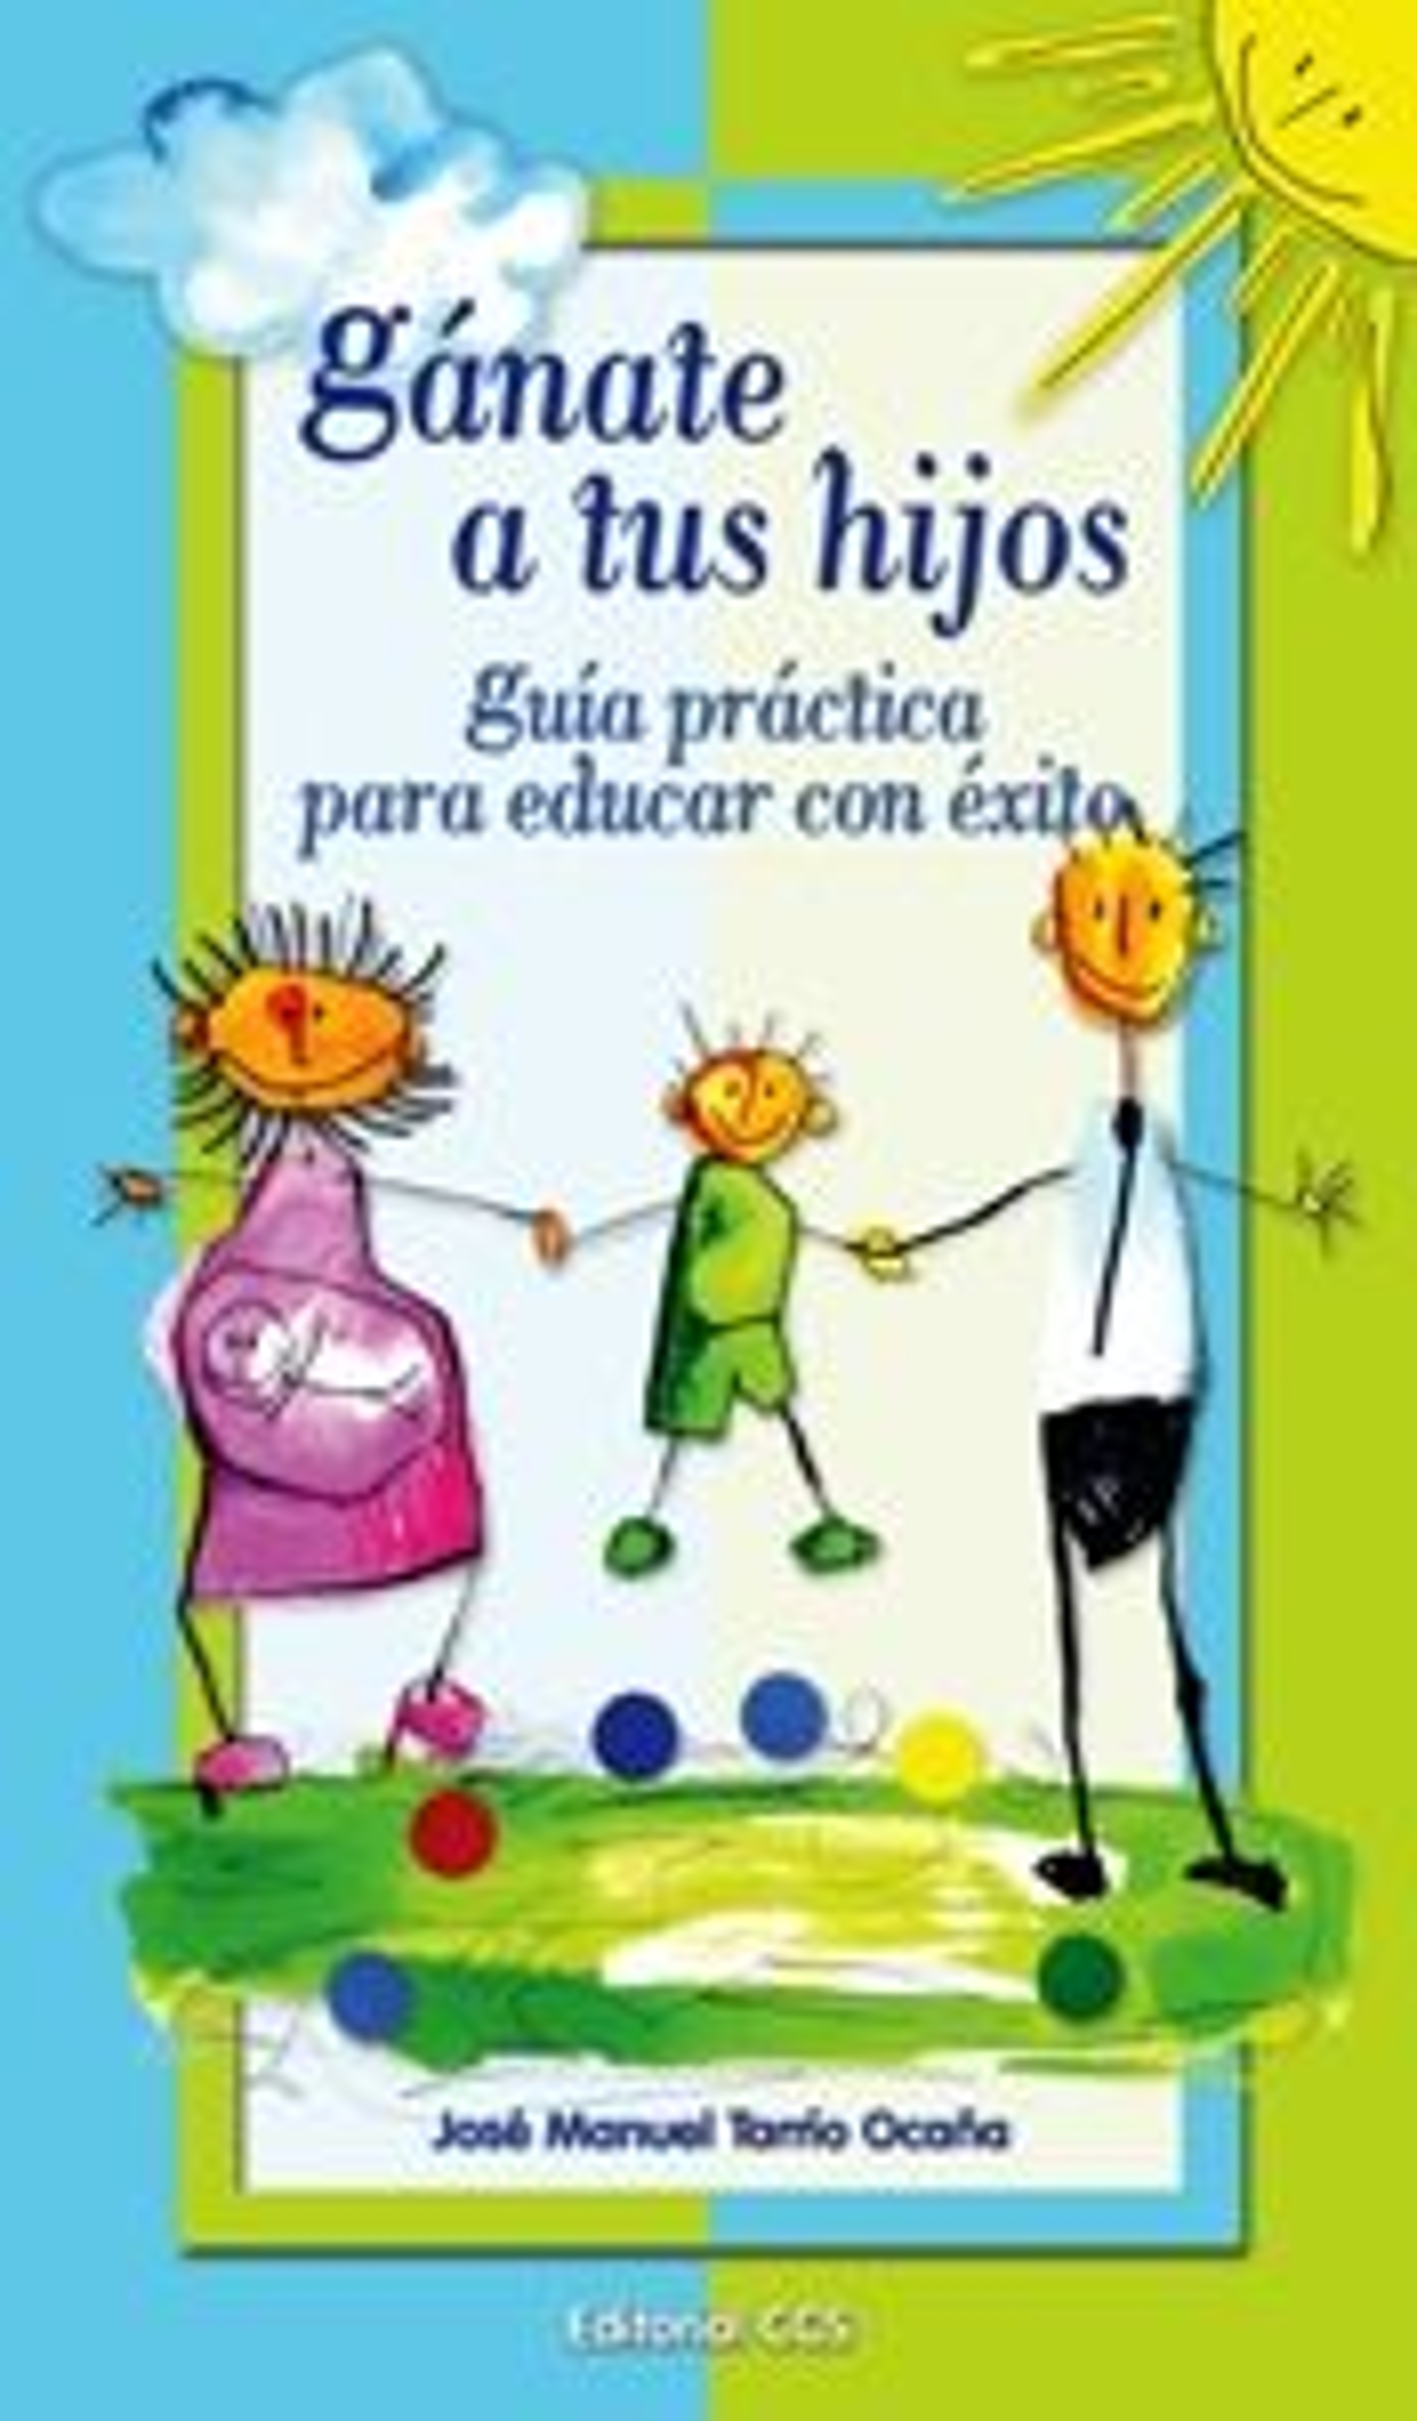 Ganate A Tus Hijos: Guia Practica Para Educar Con Exito por Jose Manuel Tarrio Ocaña epub